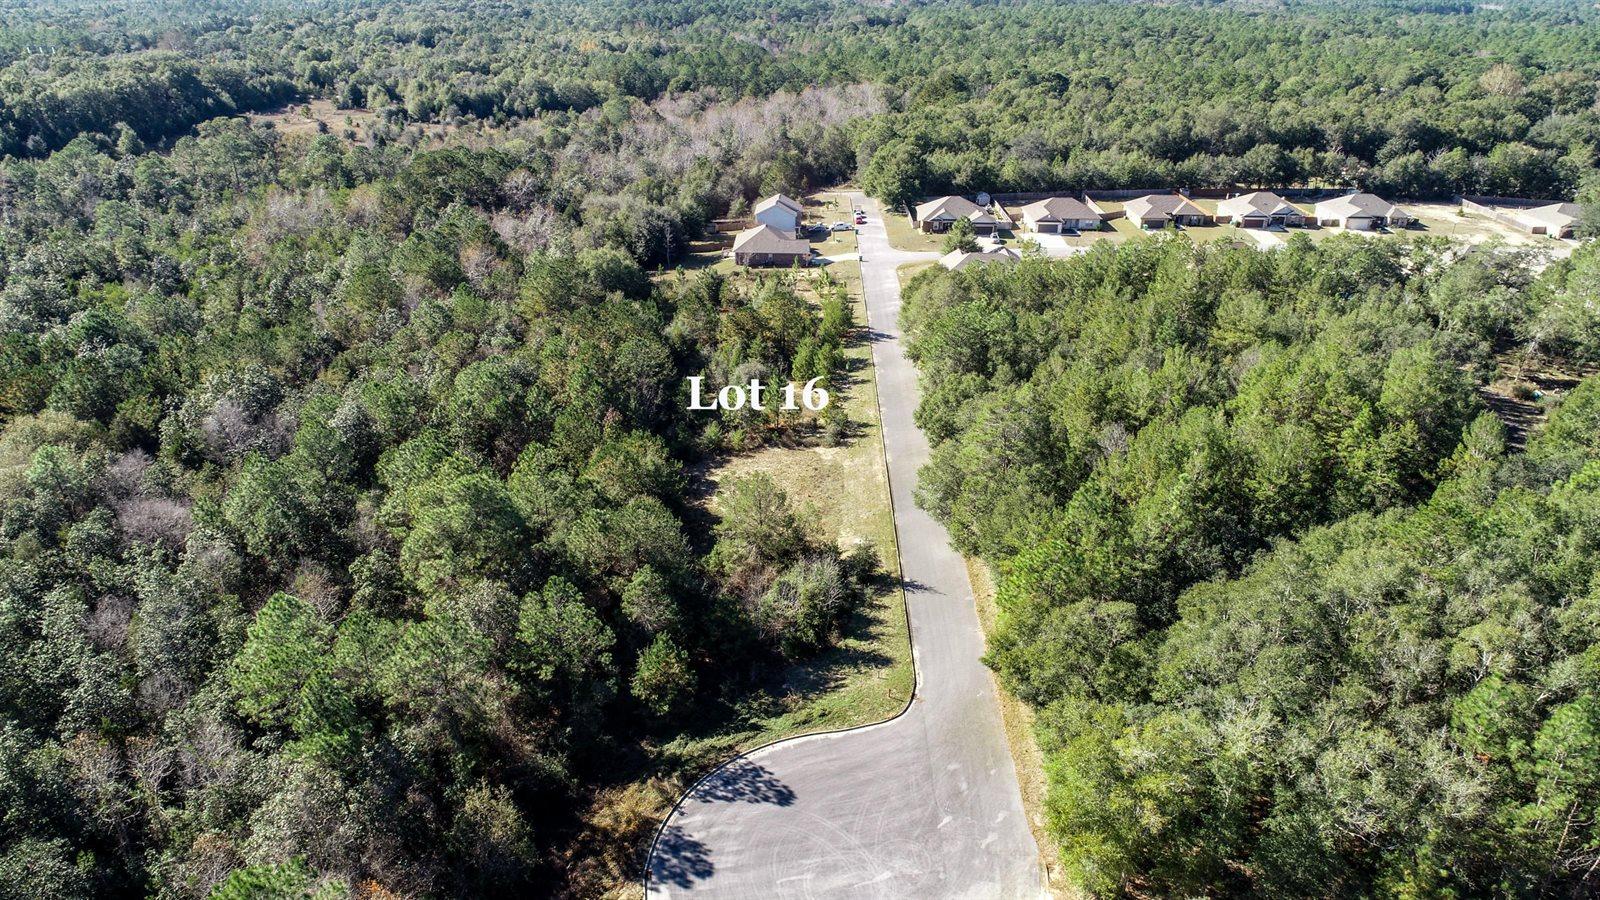 Lot 16 Wild Hare Ln, Crestview, FL 32539